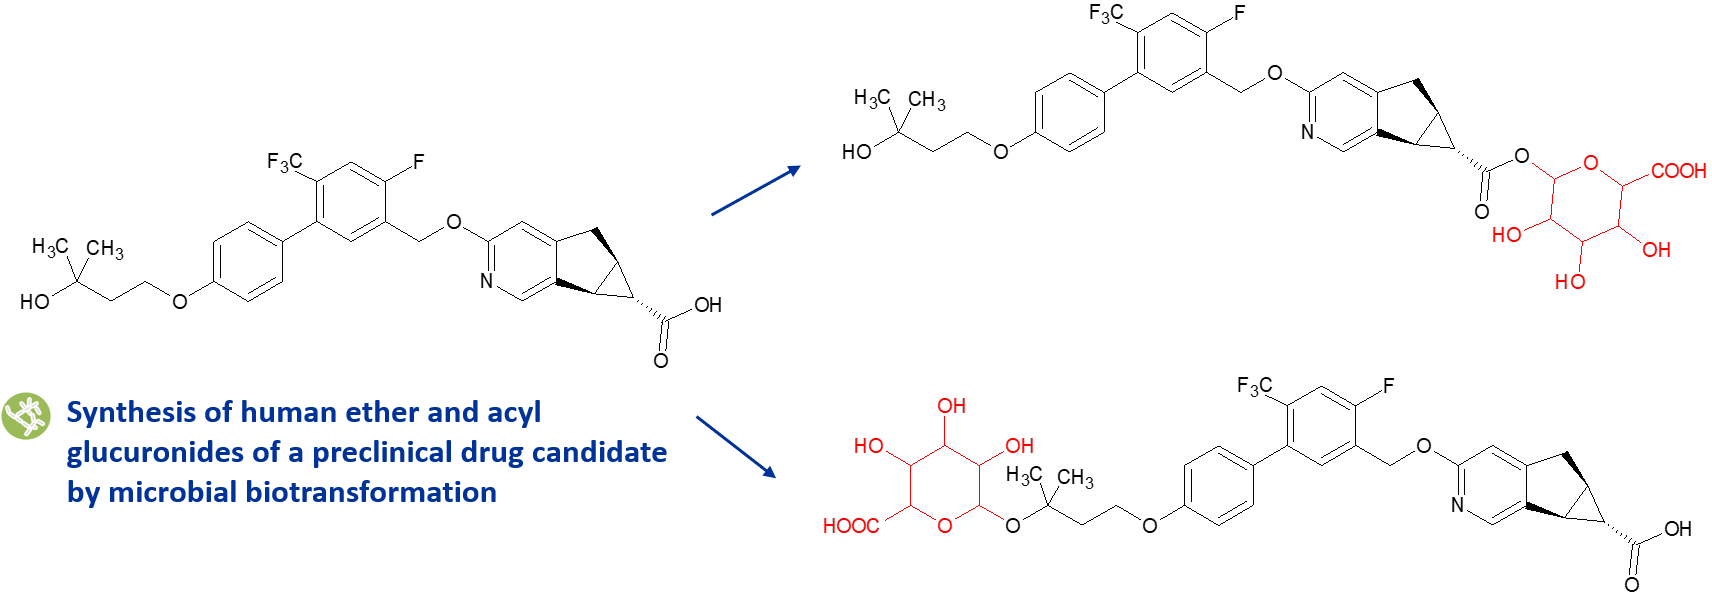 acyl glucuronide case study image